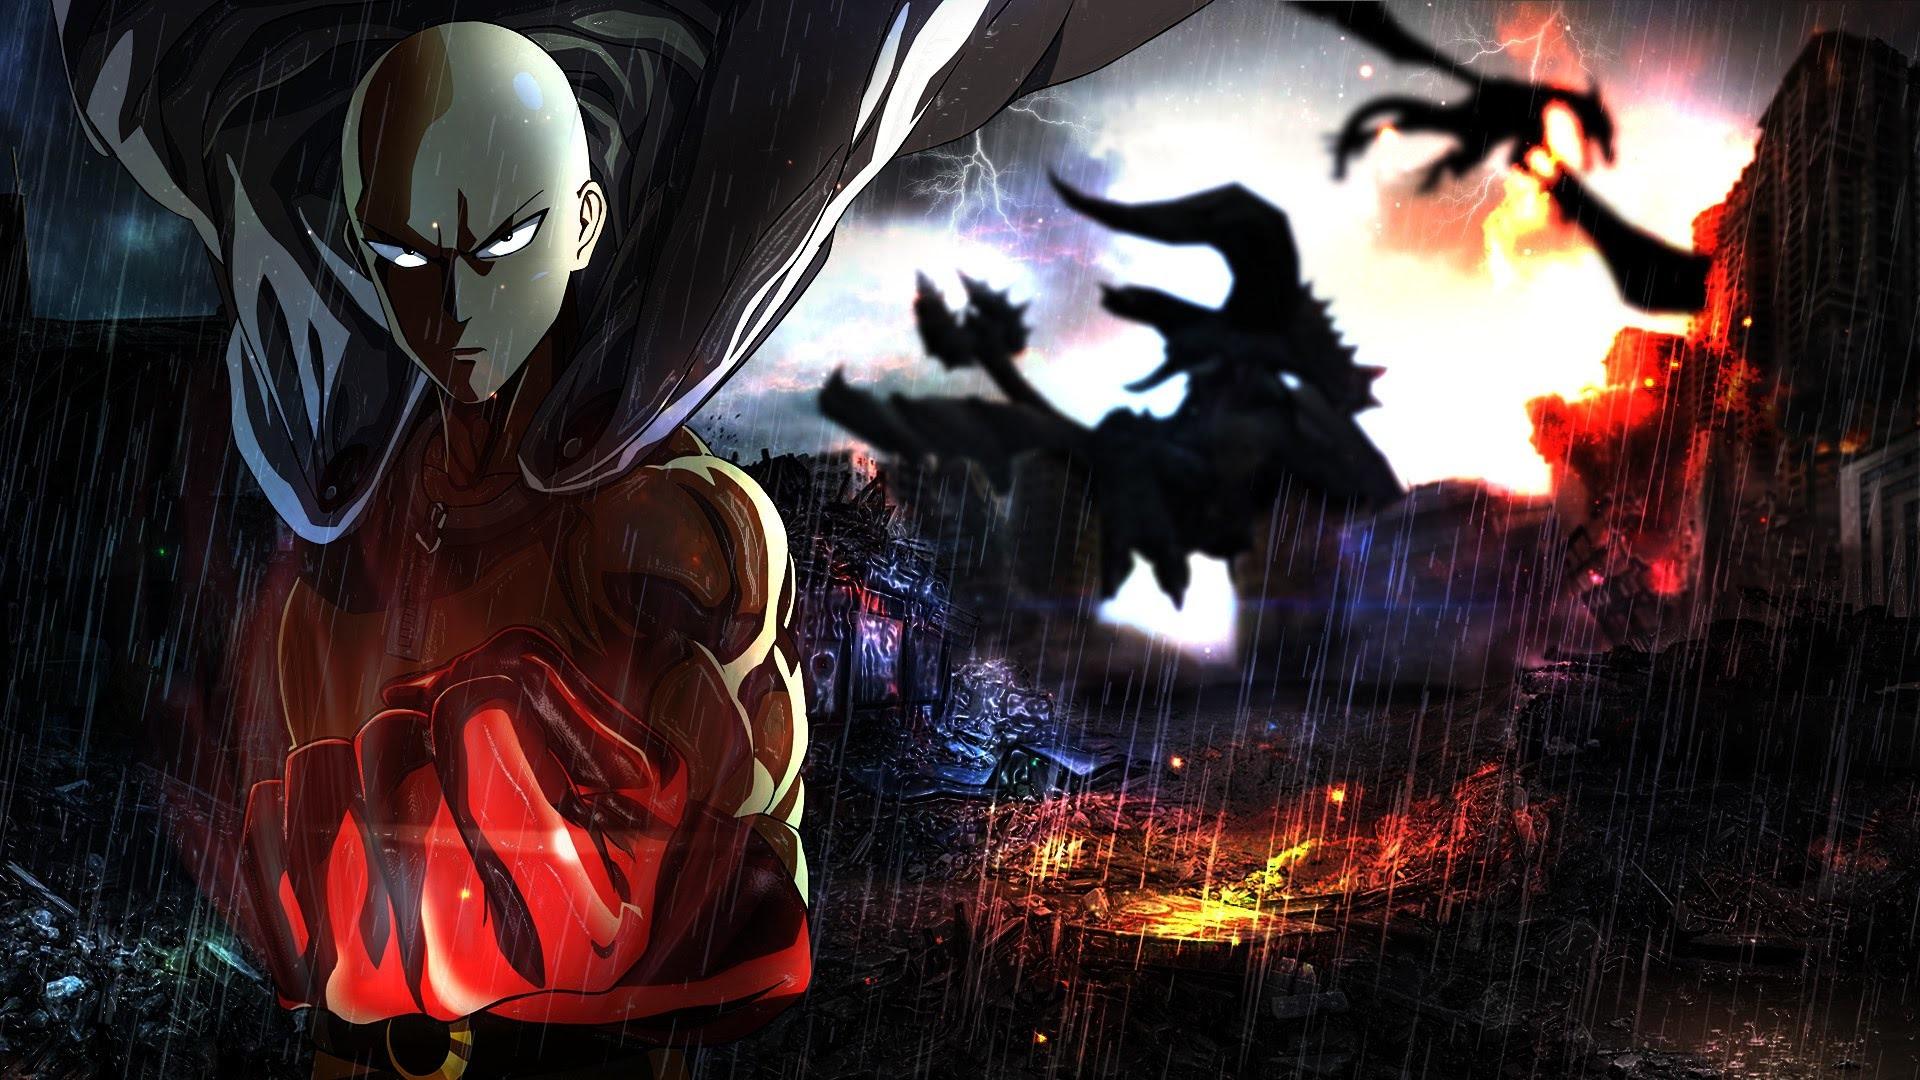 Unduh 980+ Wallpaper Hd Anime One Punch Man Gratis Terbaik